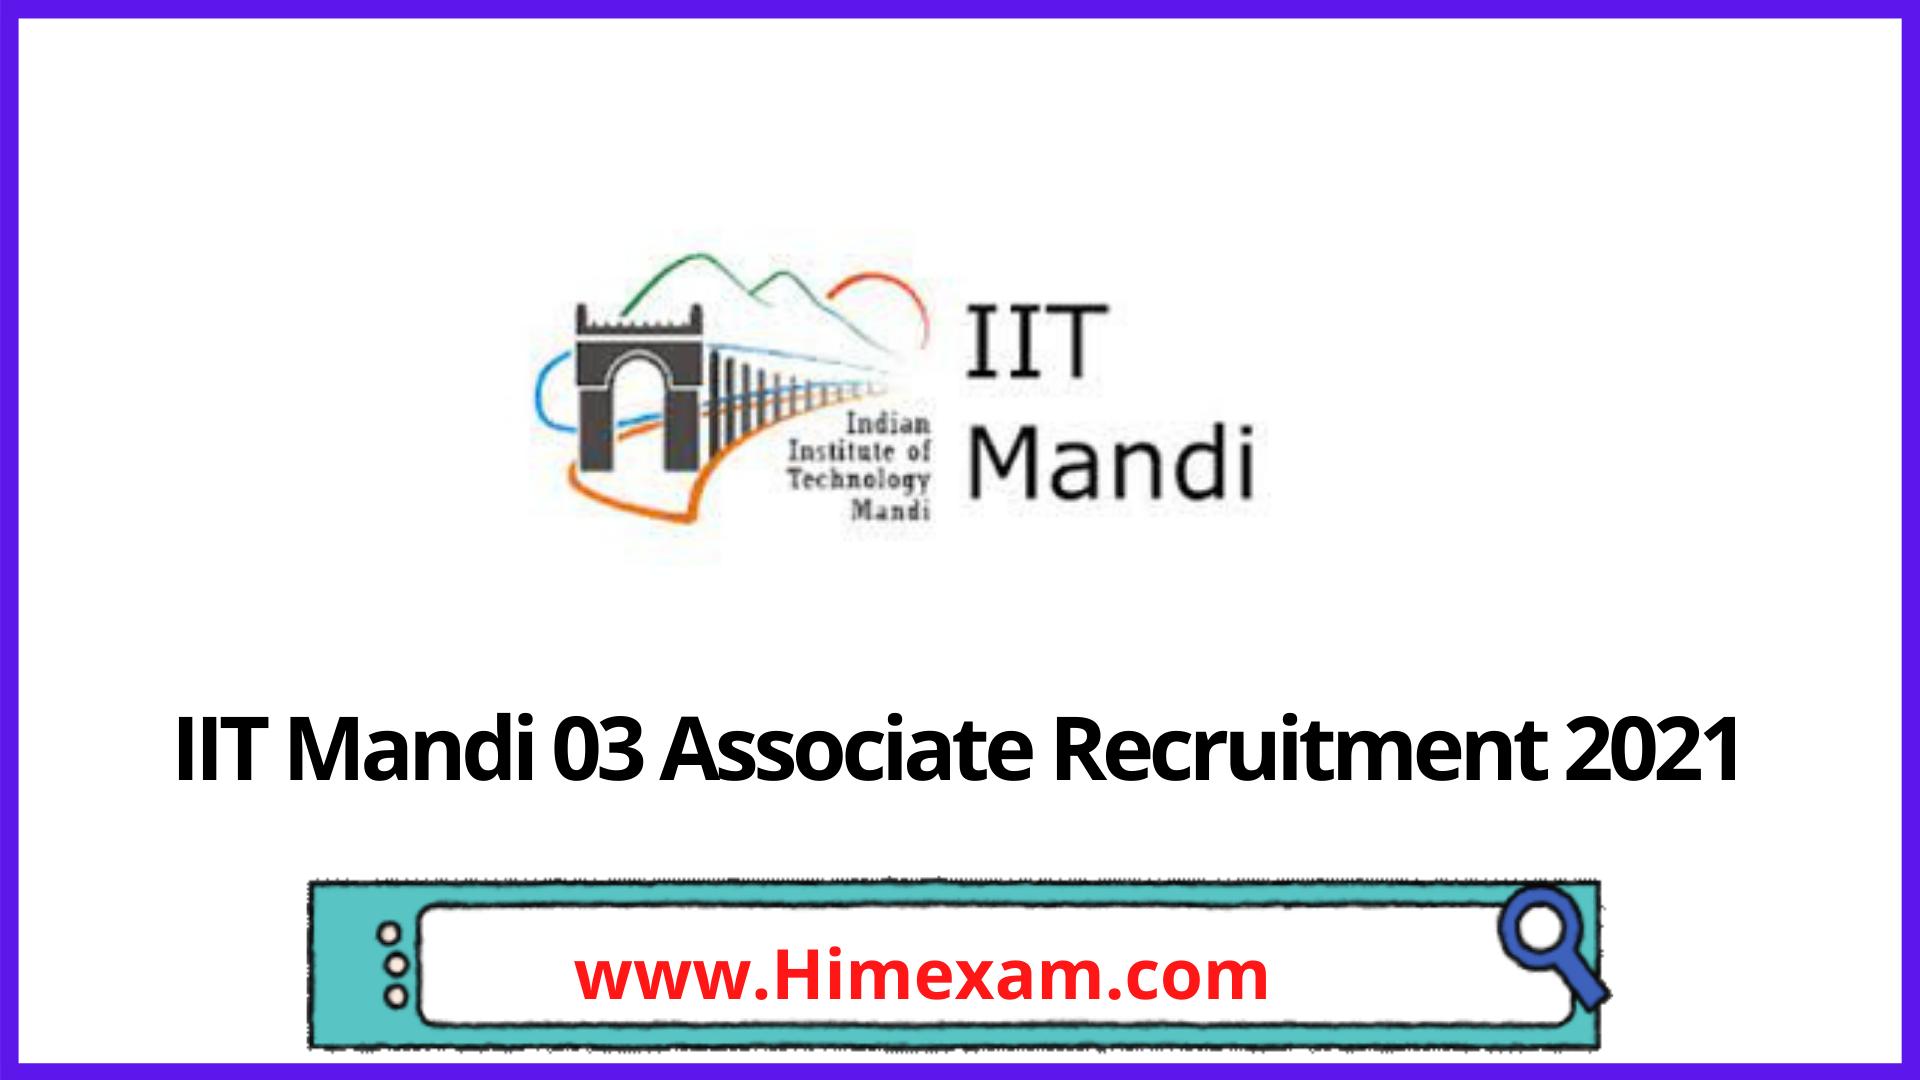 IIT Mandi 03 Associate Recruitment 2021